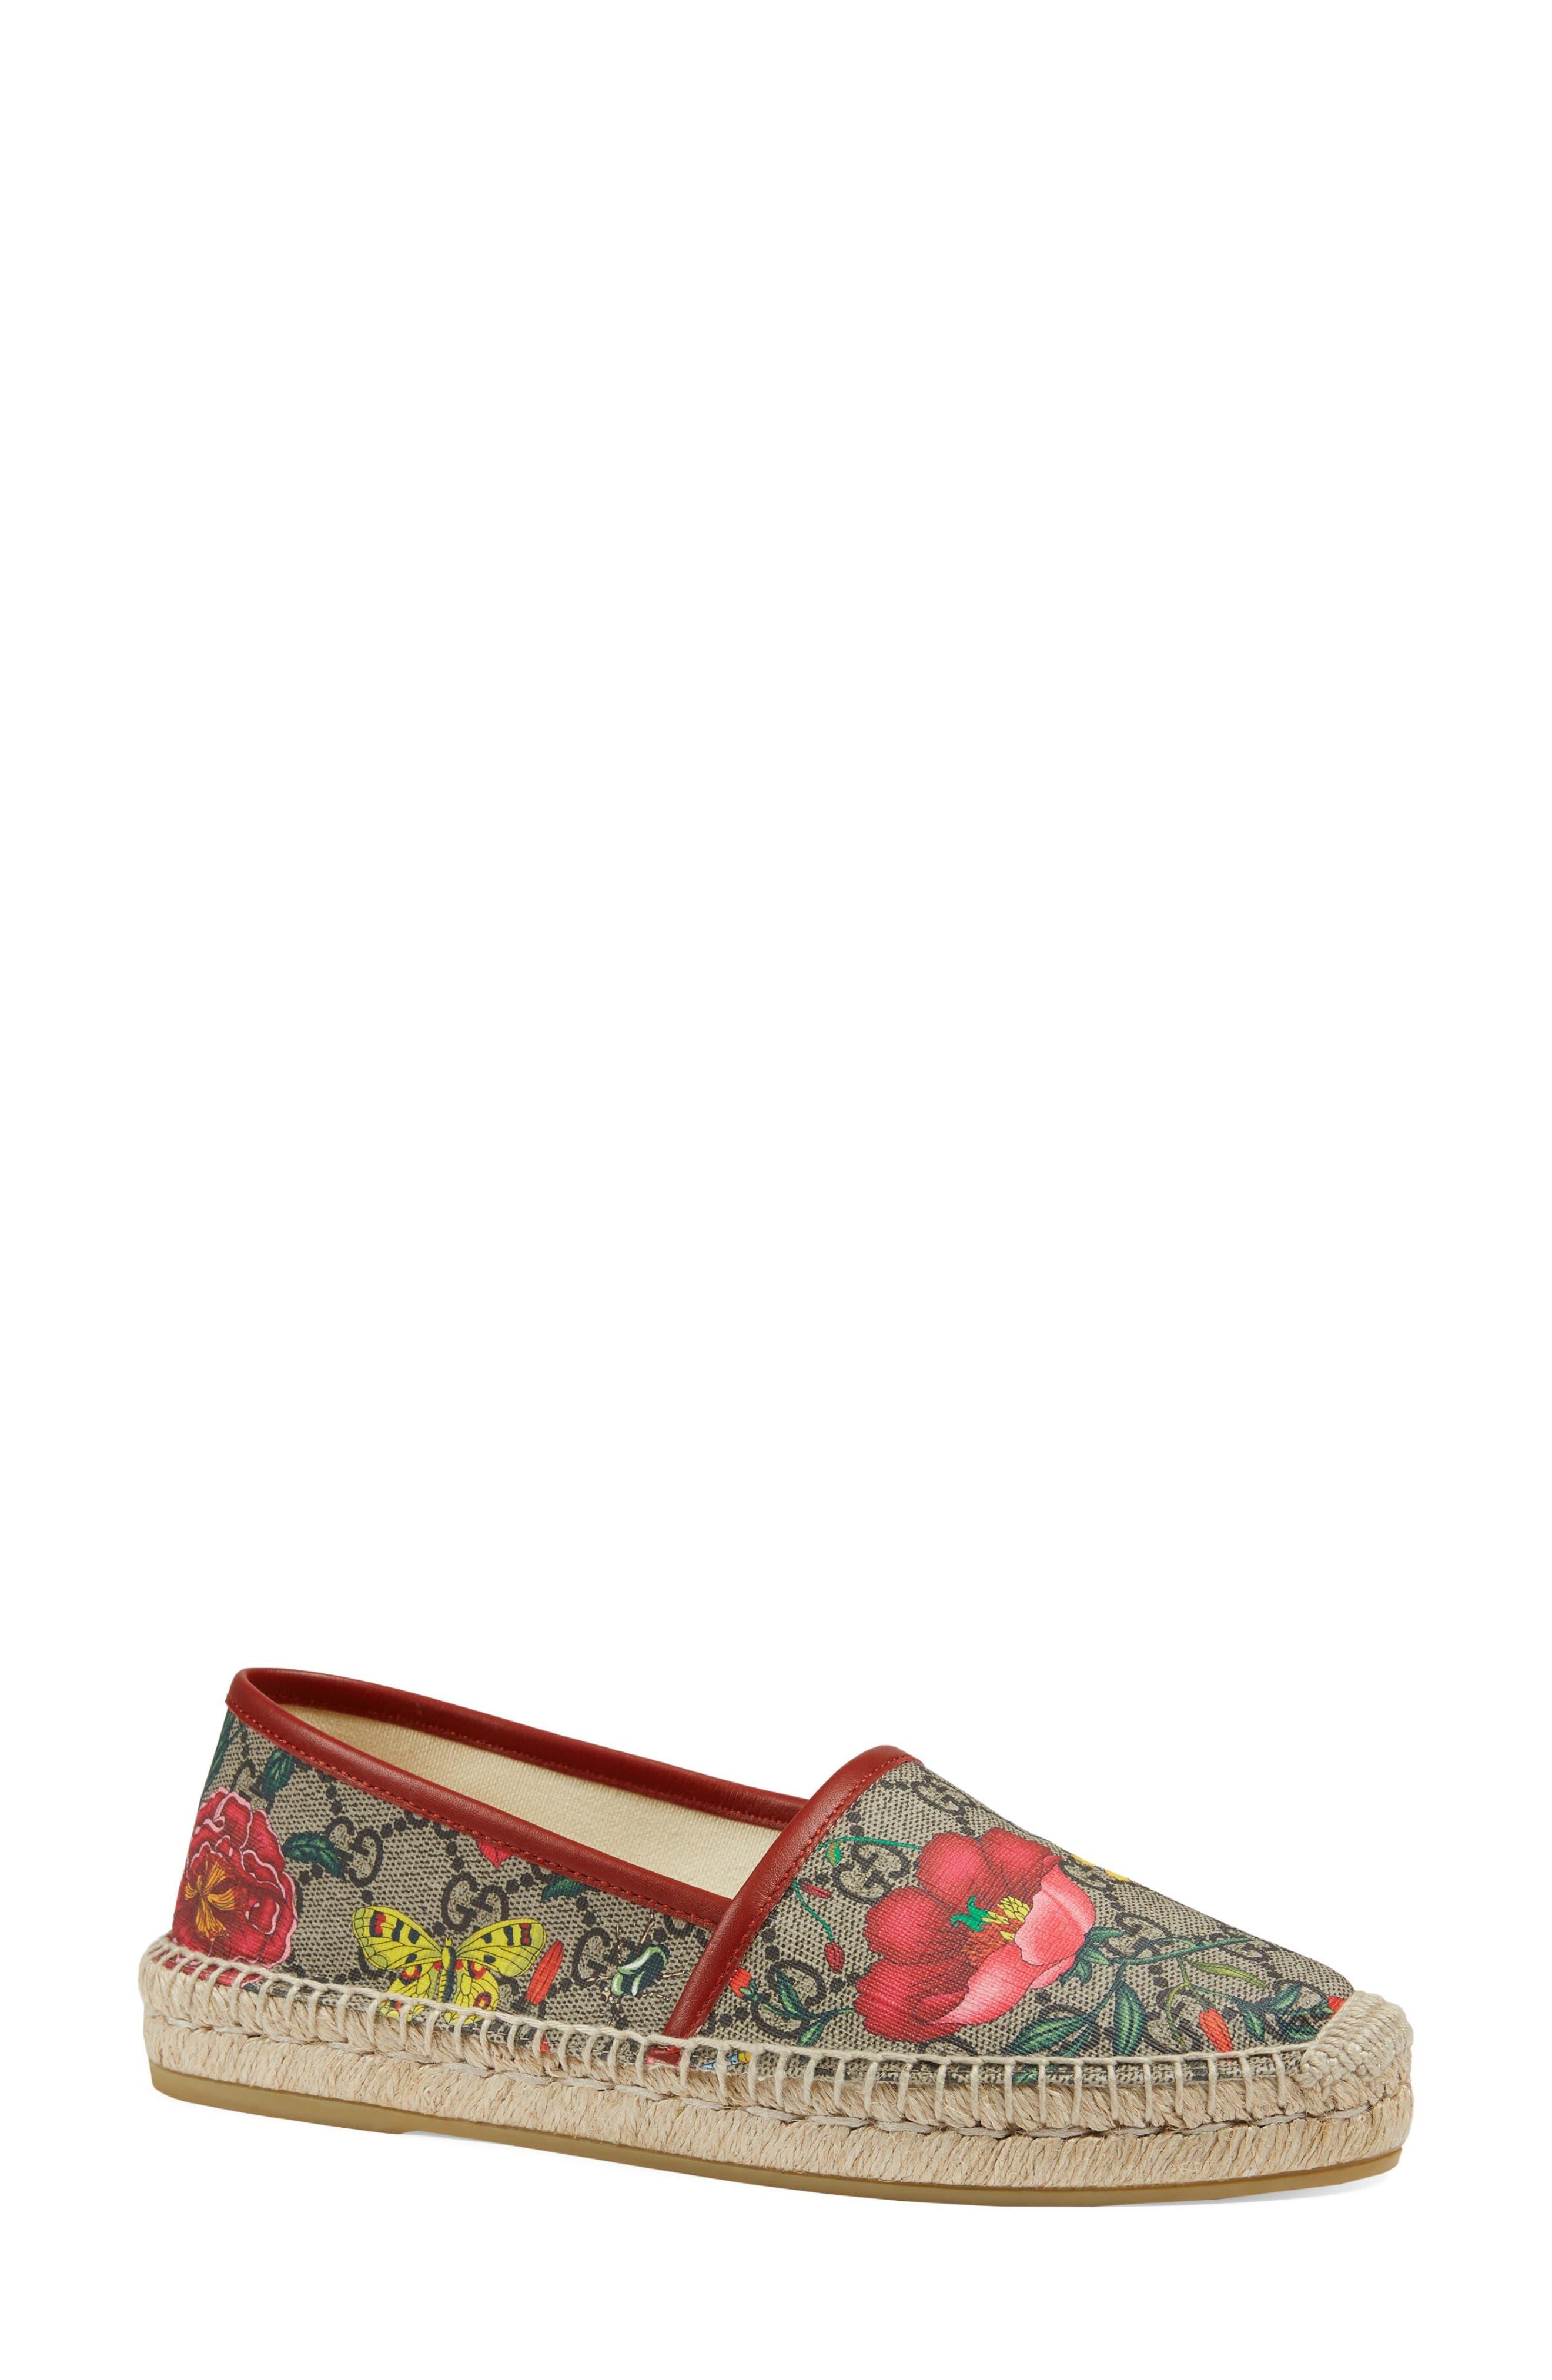 Gucci Pilar Floral GG Supreme Espadrille Flat (Women)